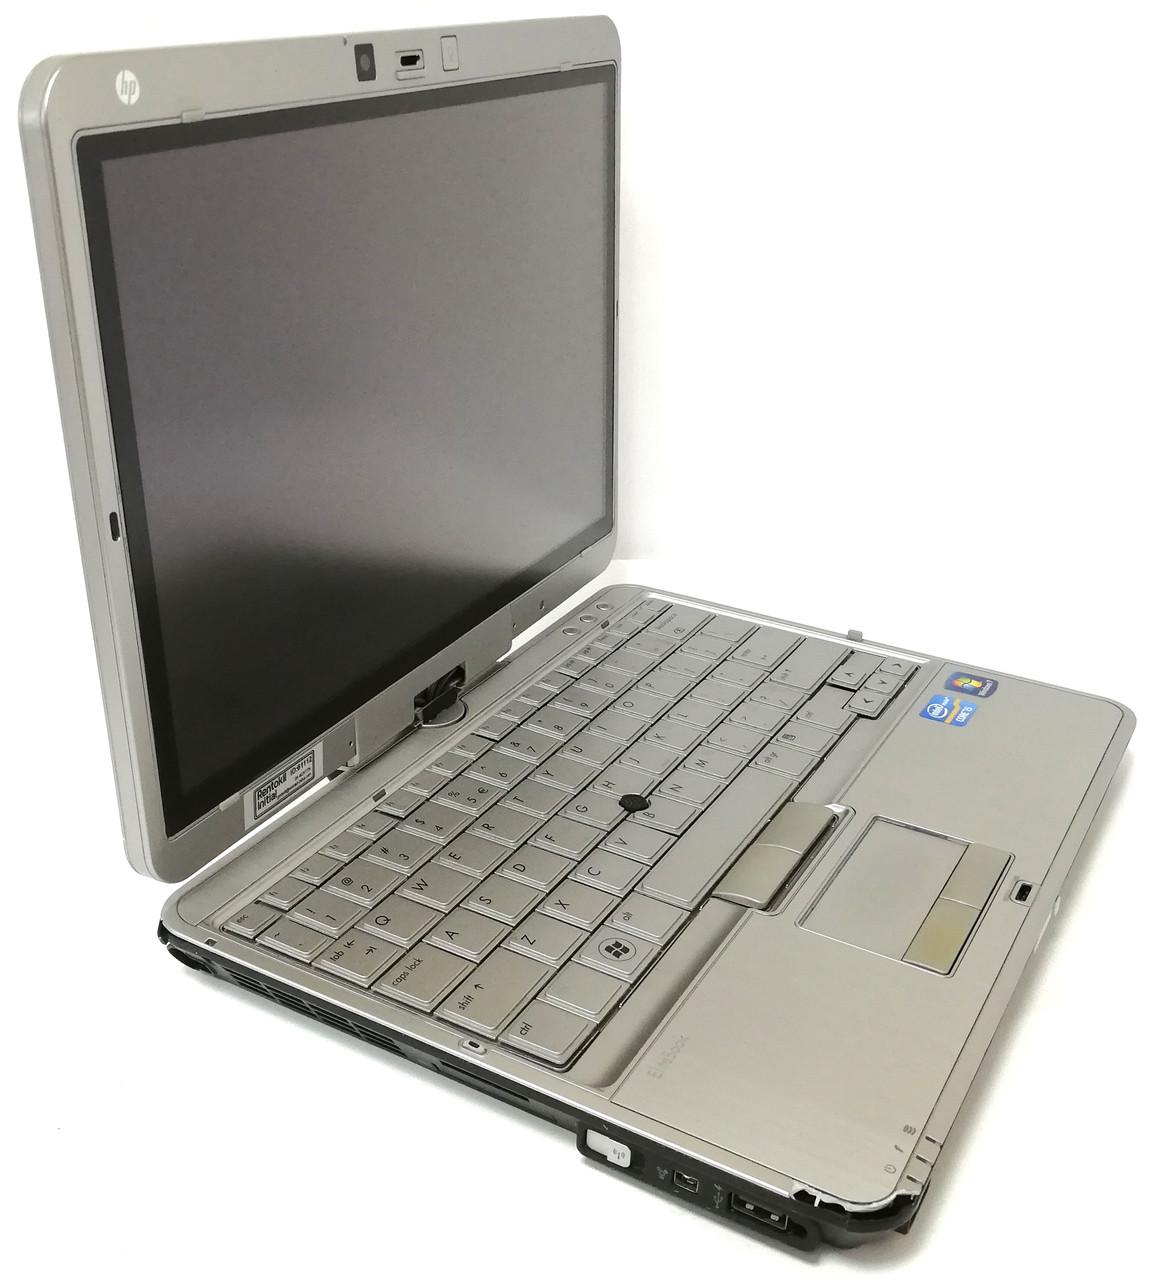 "Ноутбук-трансформер HP EliteBook 2760P 12.1"" Intel Core i5-2540M 2.6 ГГц 1 ГБ Б/У"